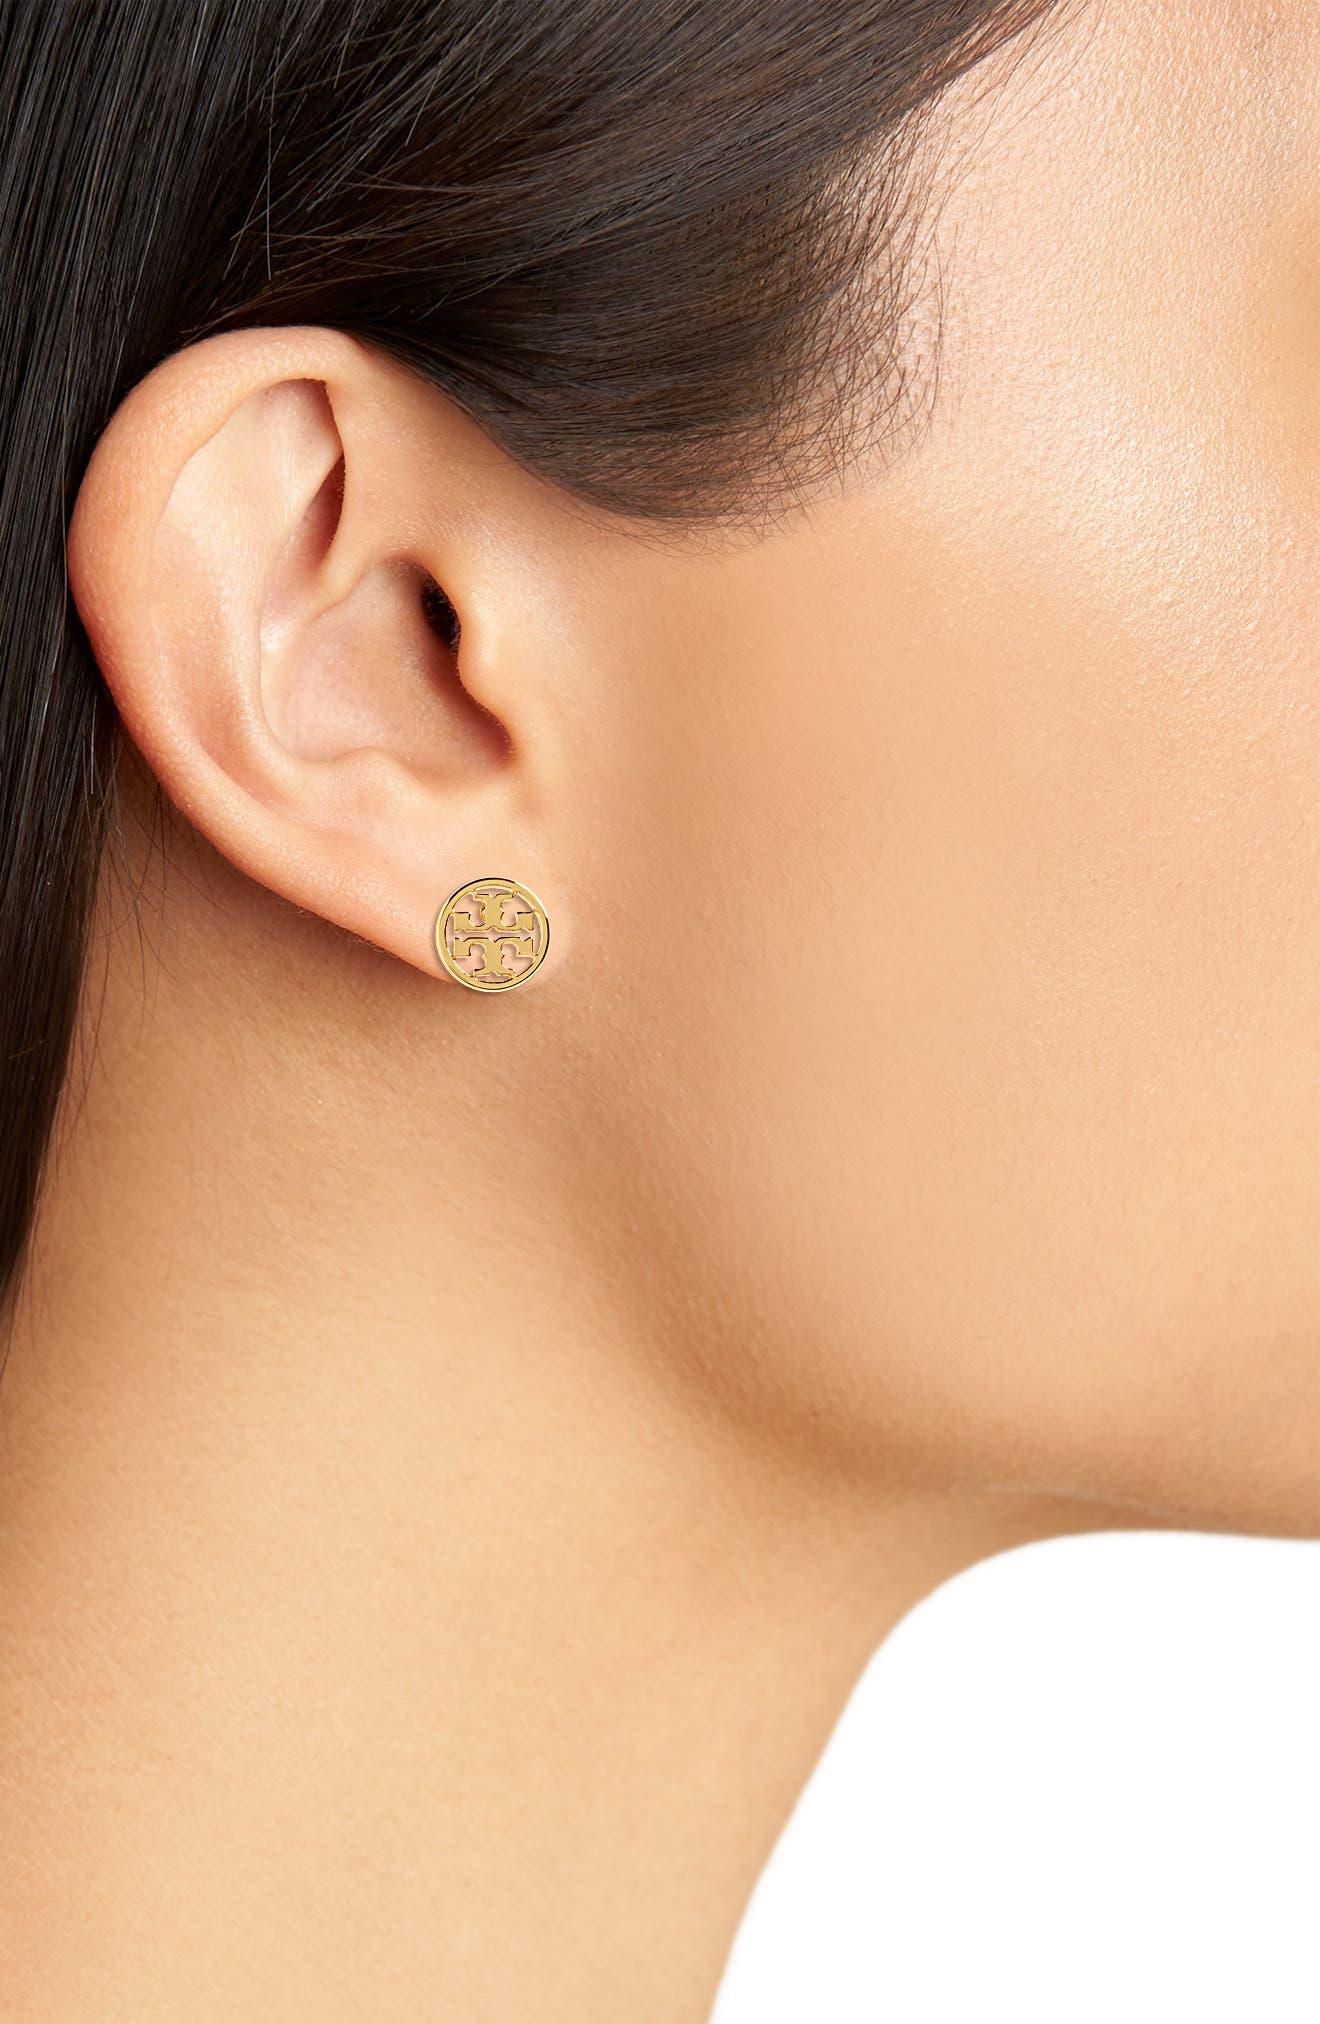 TORY BURCH, Circle Logo Stud Earrings, Alternate thumbnail 2, color, TORY GOLD